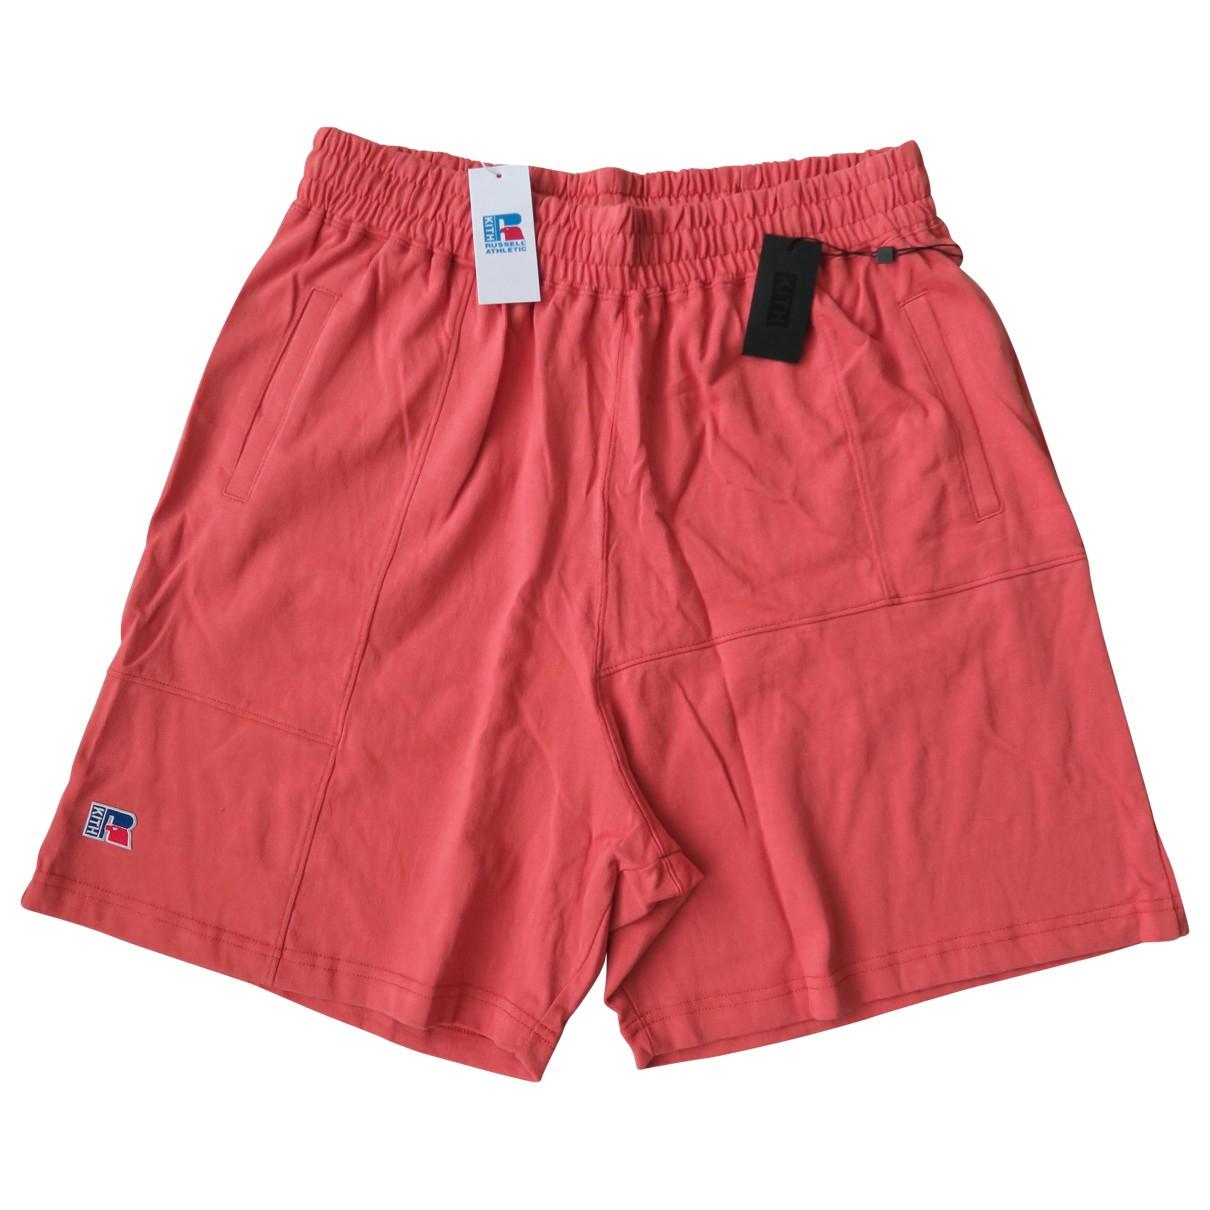 Kith \N Cotton Shorts for Men XL International